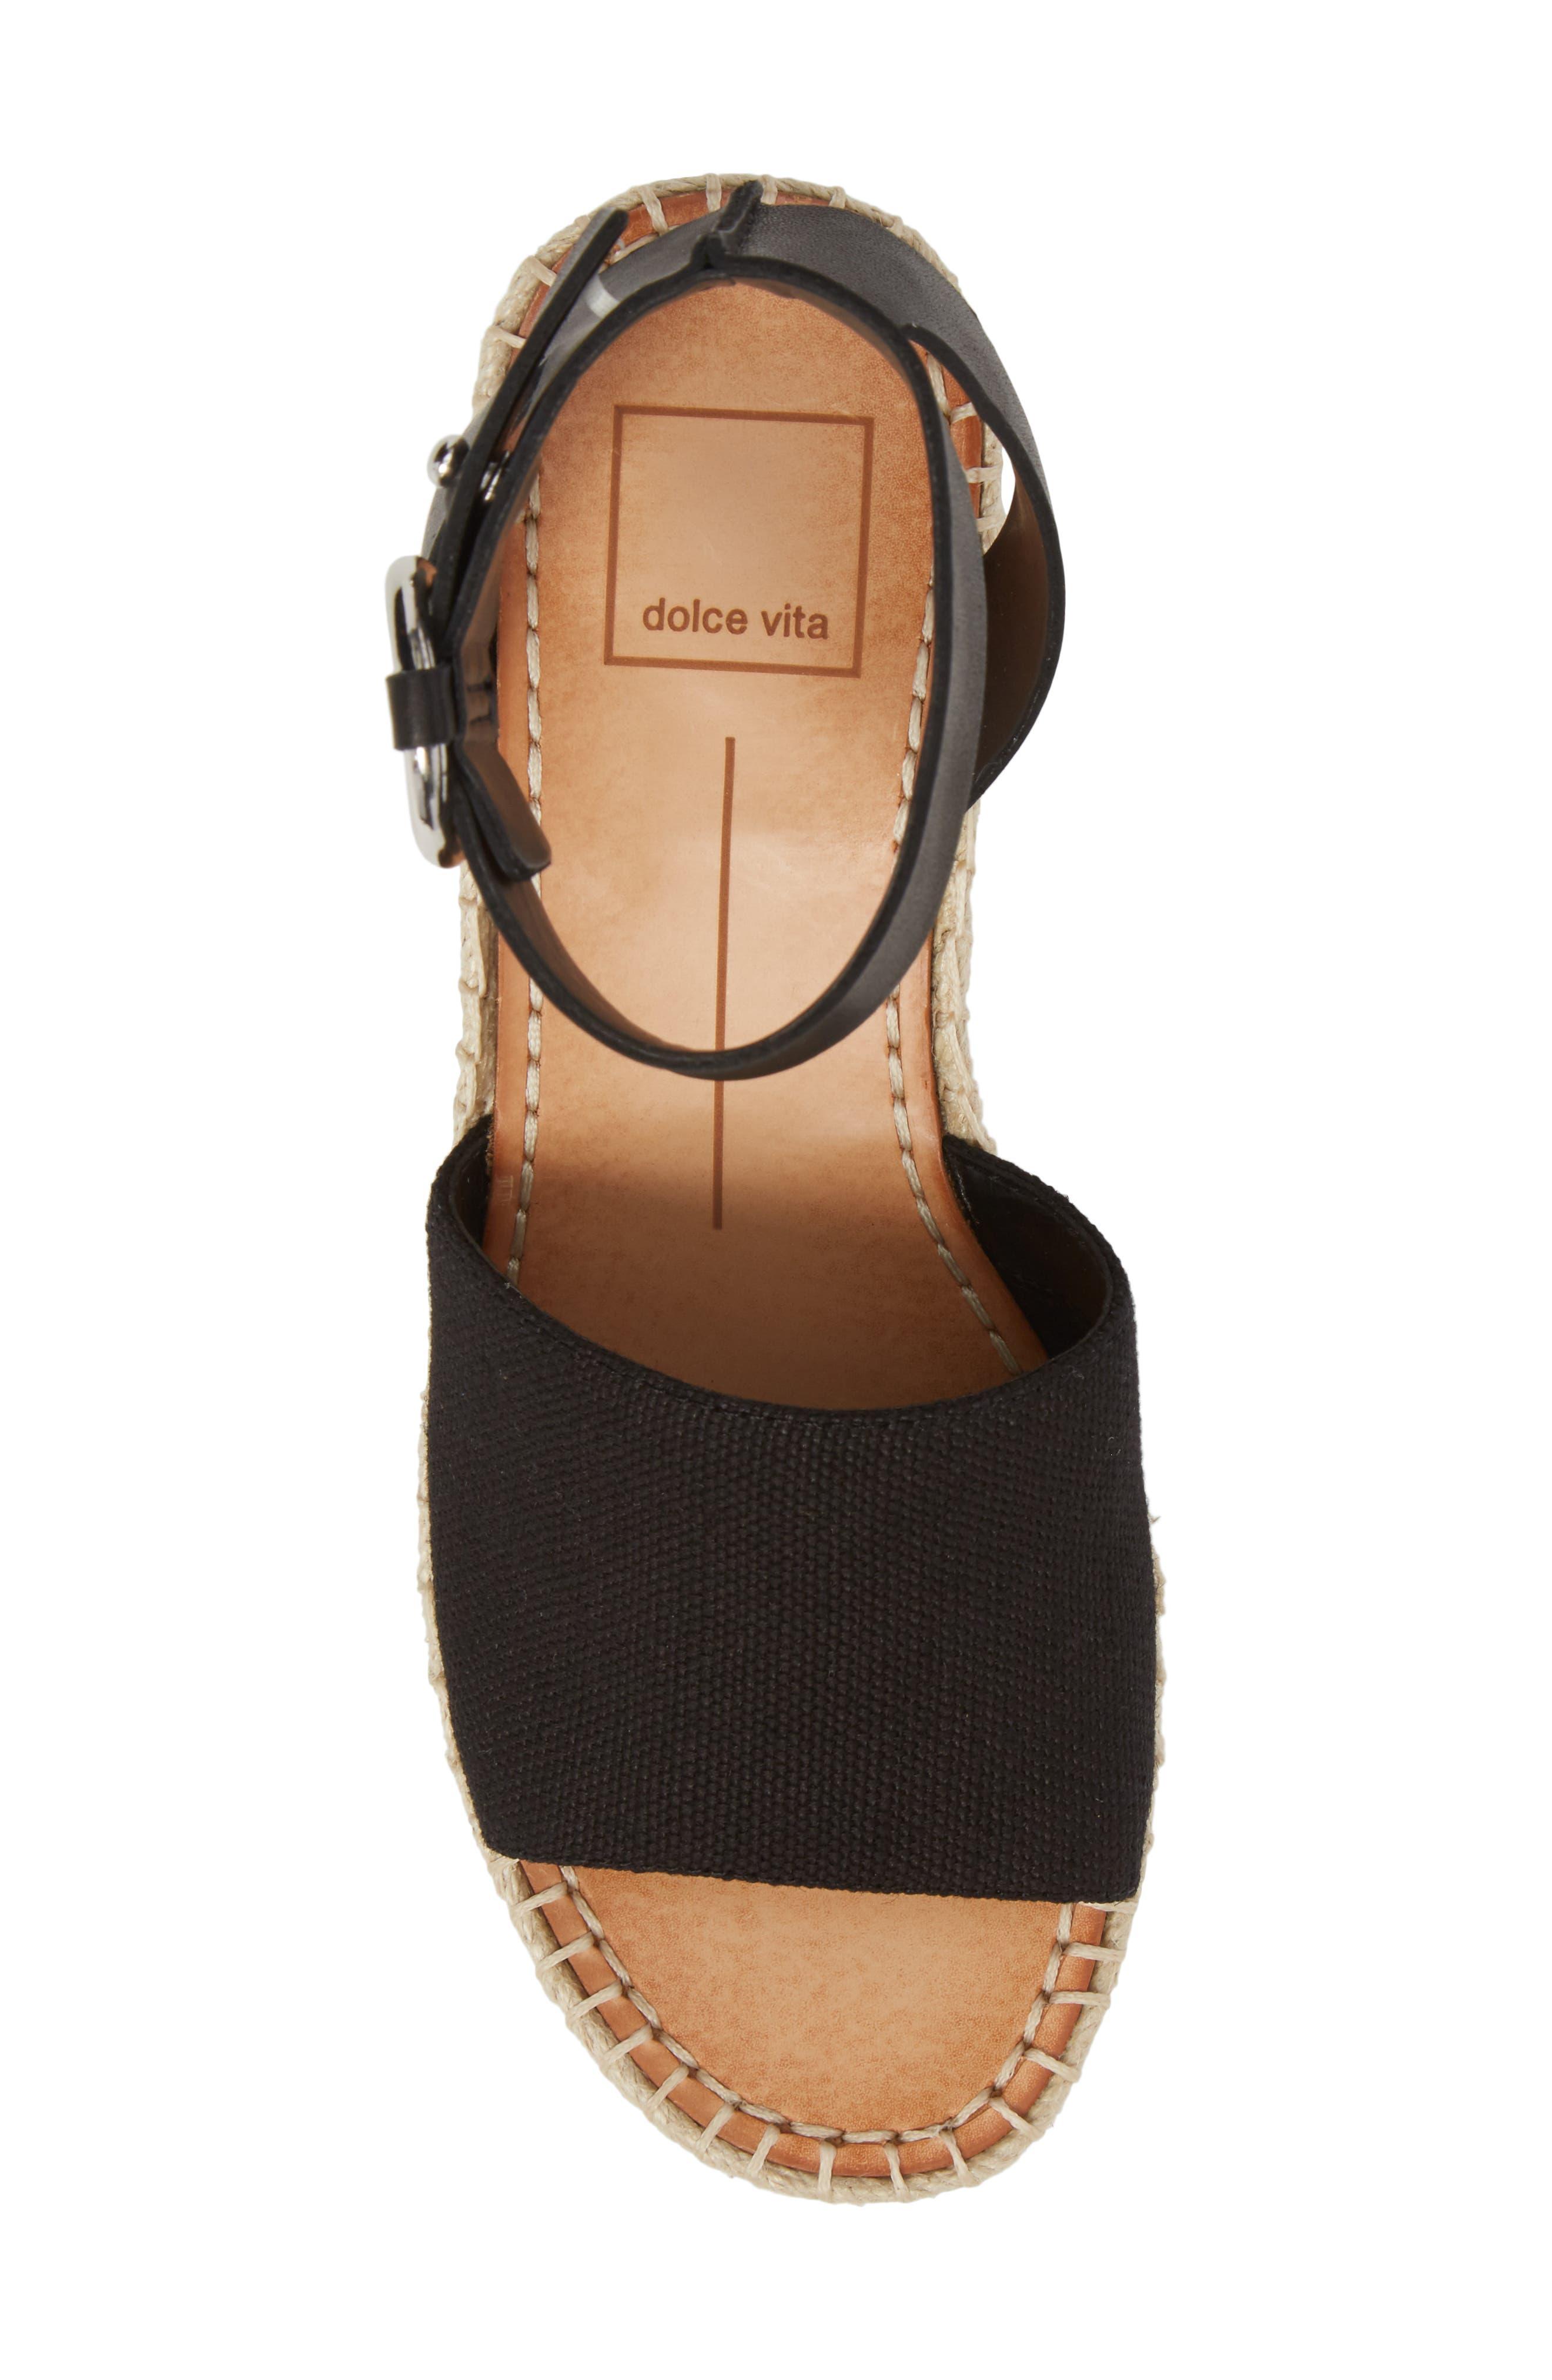 DOLCE VITA, Lesly Espadrille Platform Sandal, Alternate thumbnail 5, color, 001